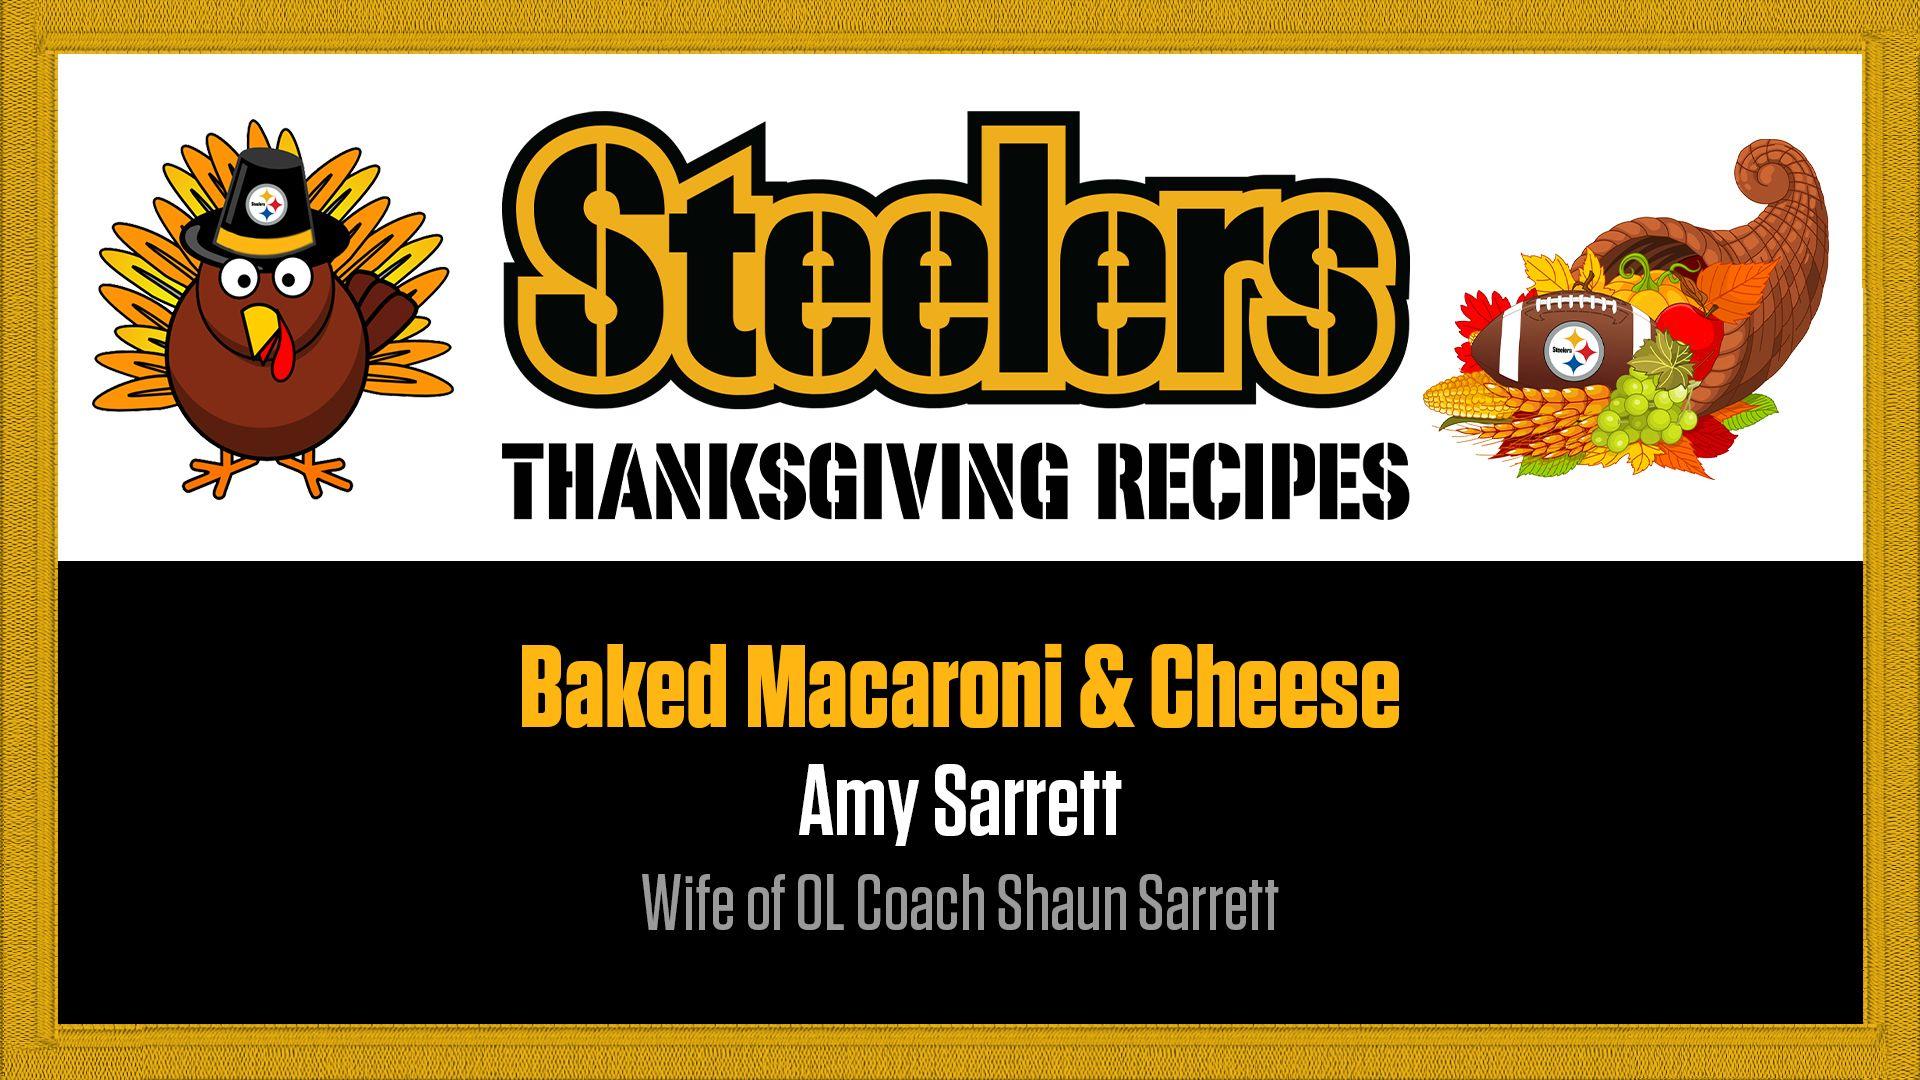 Recipe - baked macaroni and cheese_amy sarrett